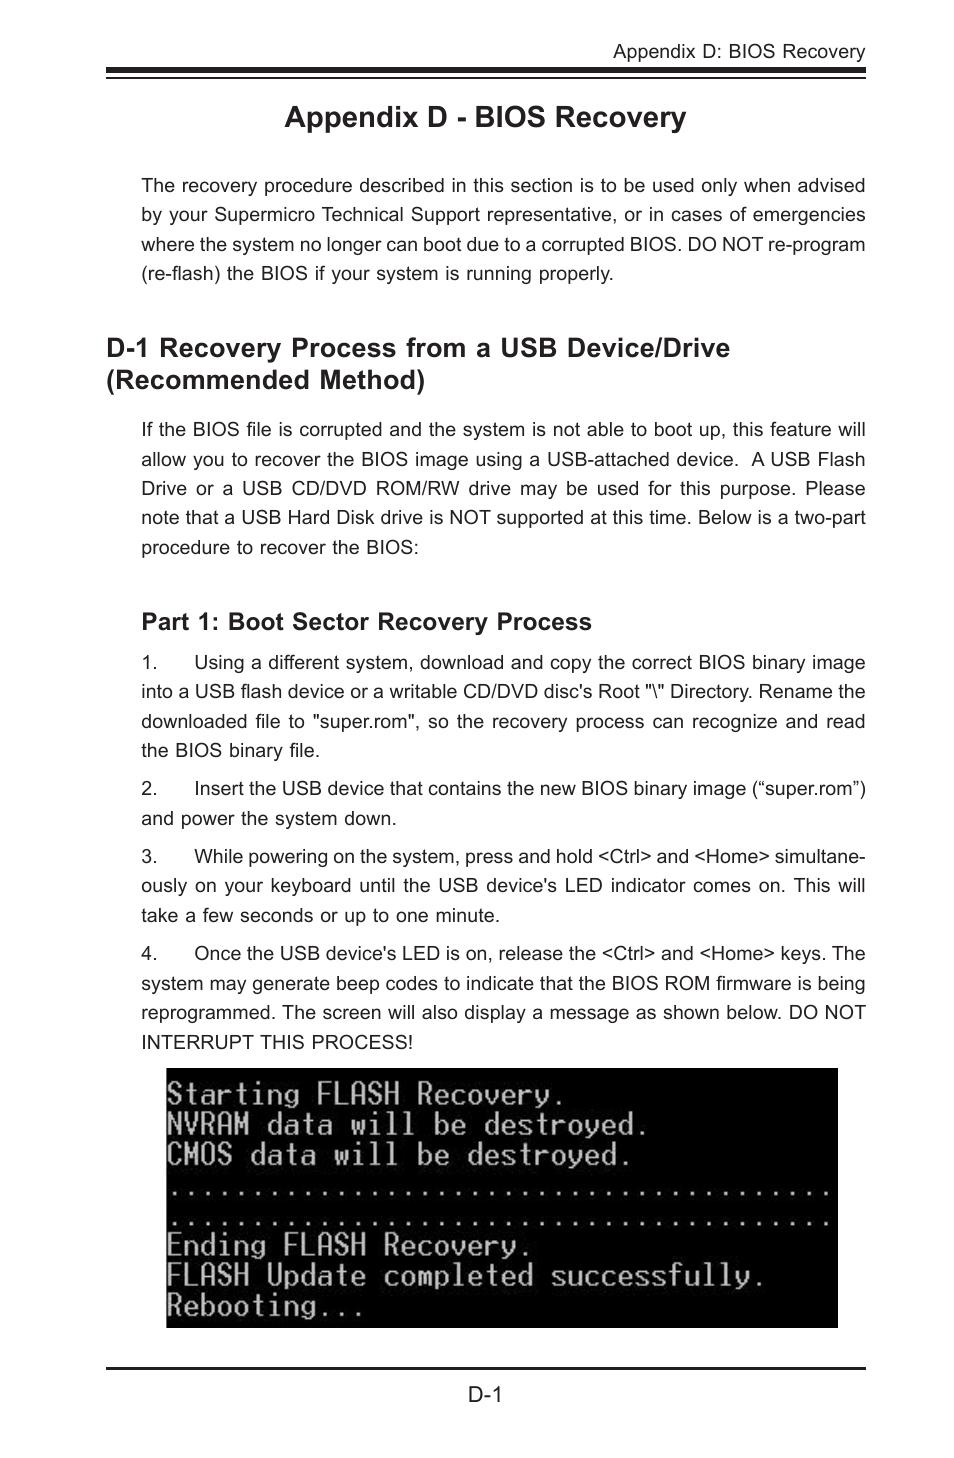 Appendix d - bios recovery   SUPER MICRO Computer SUPER X8STE User